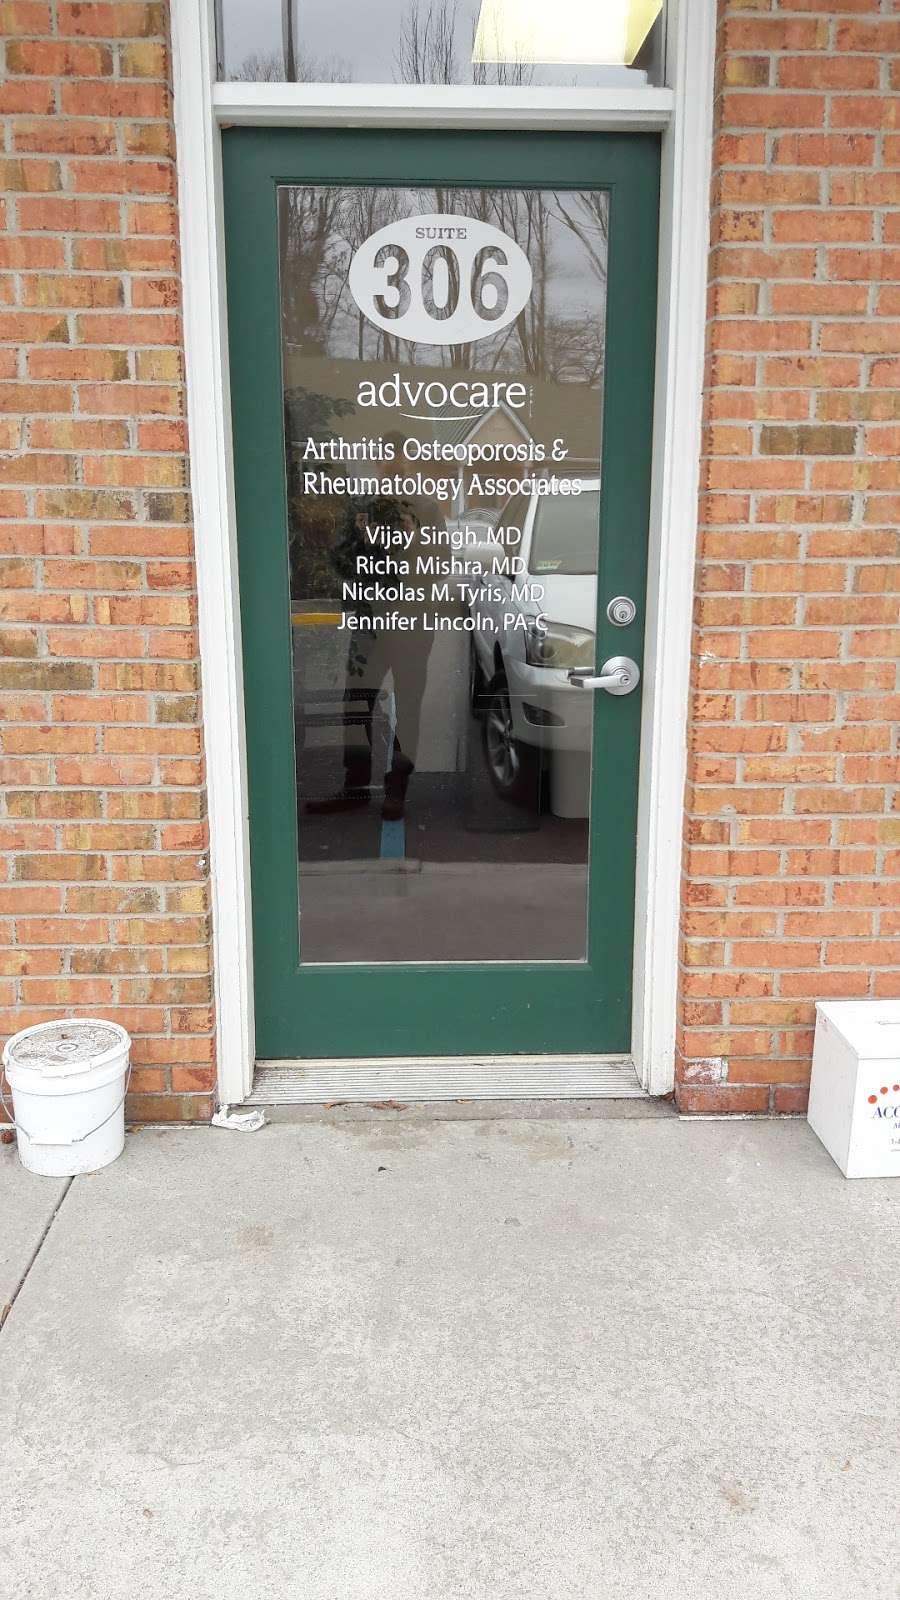 28++ Advocare arthritis osteoporosis and rheumatology ideas